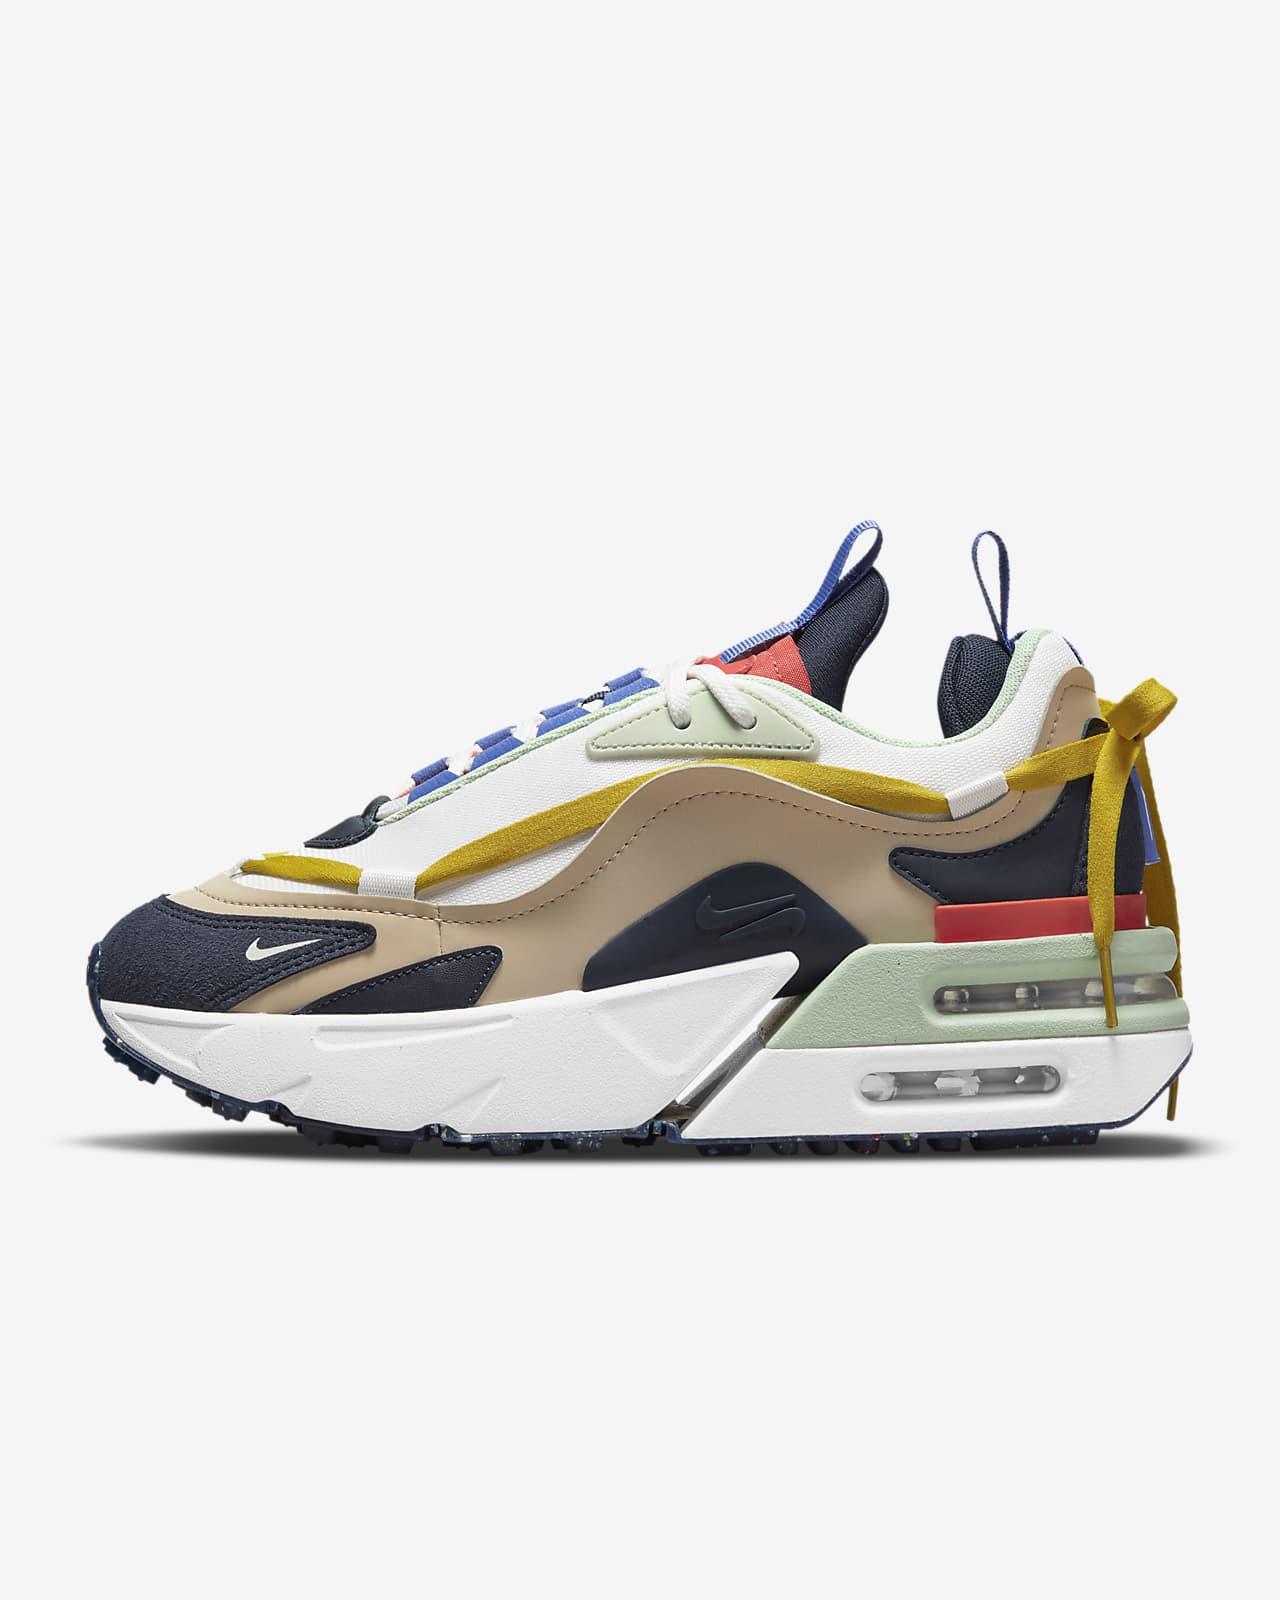 Nike Air Max Furyosa Women's Shoes